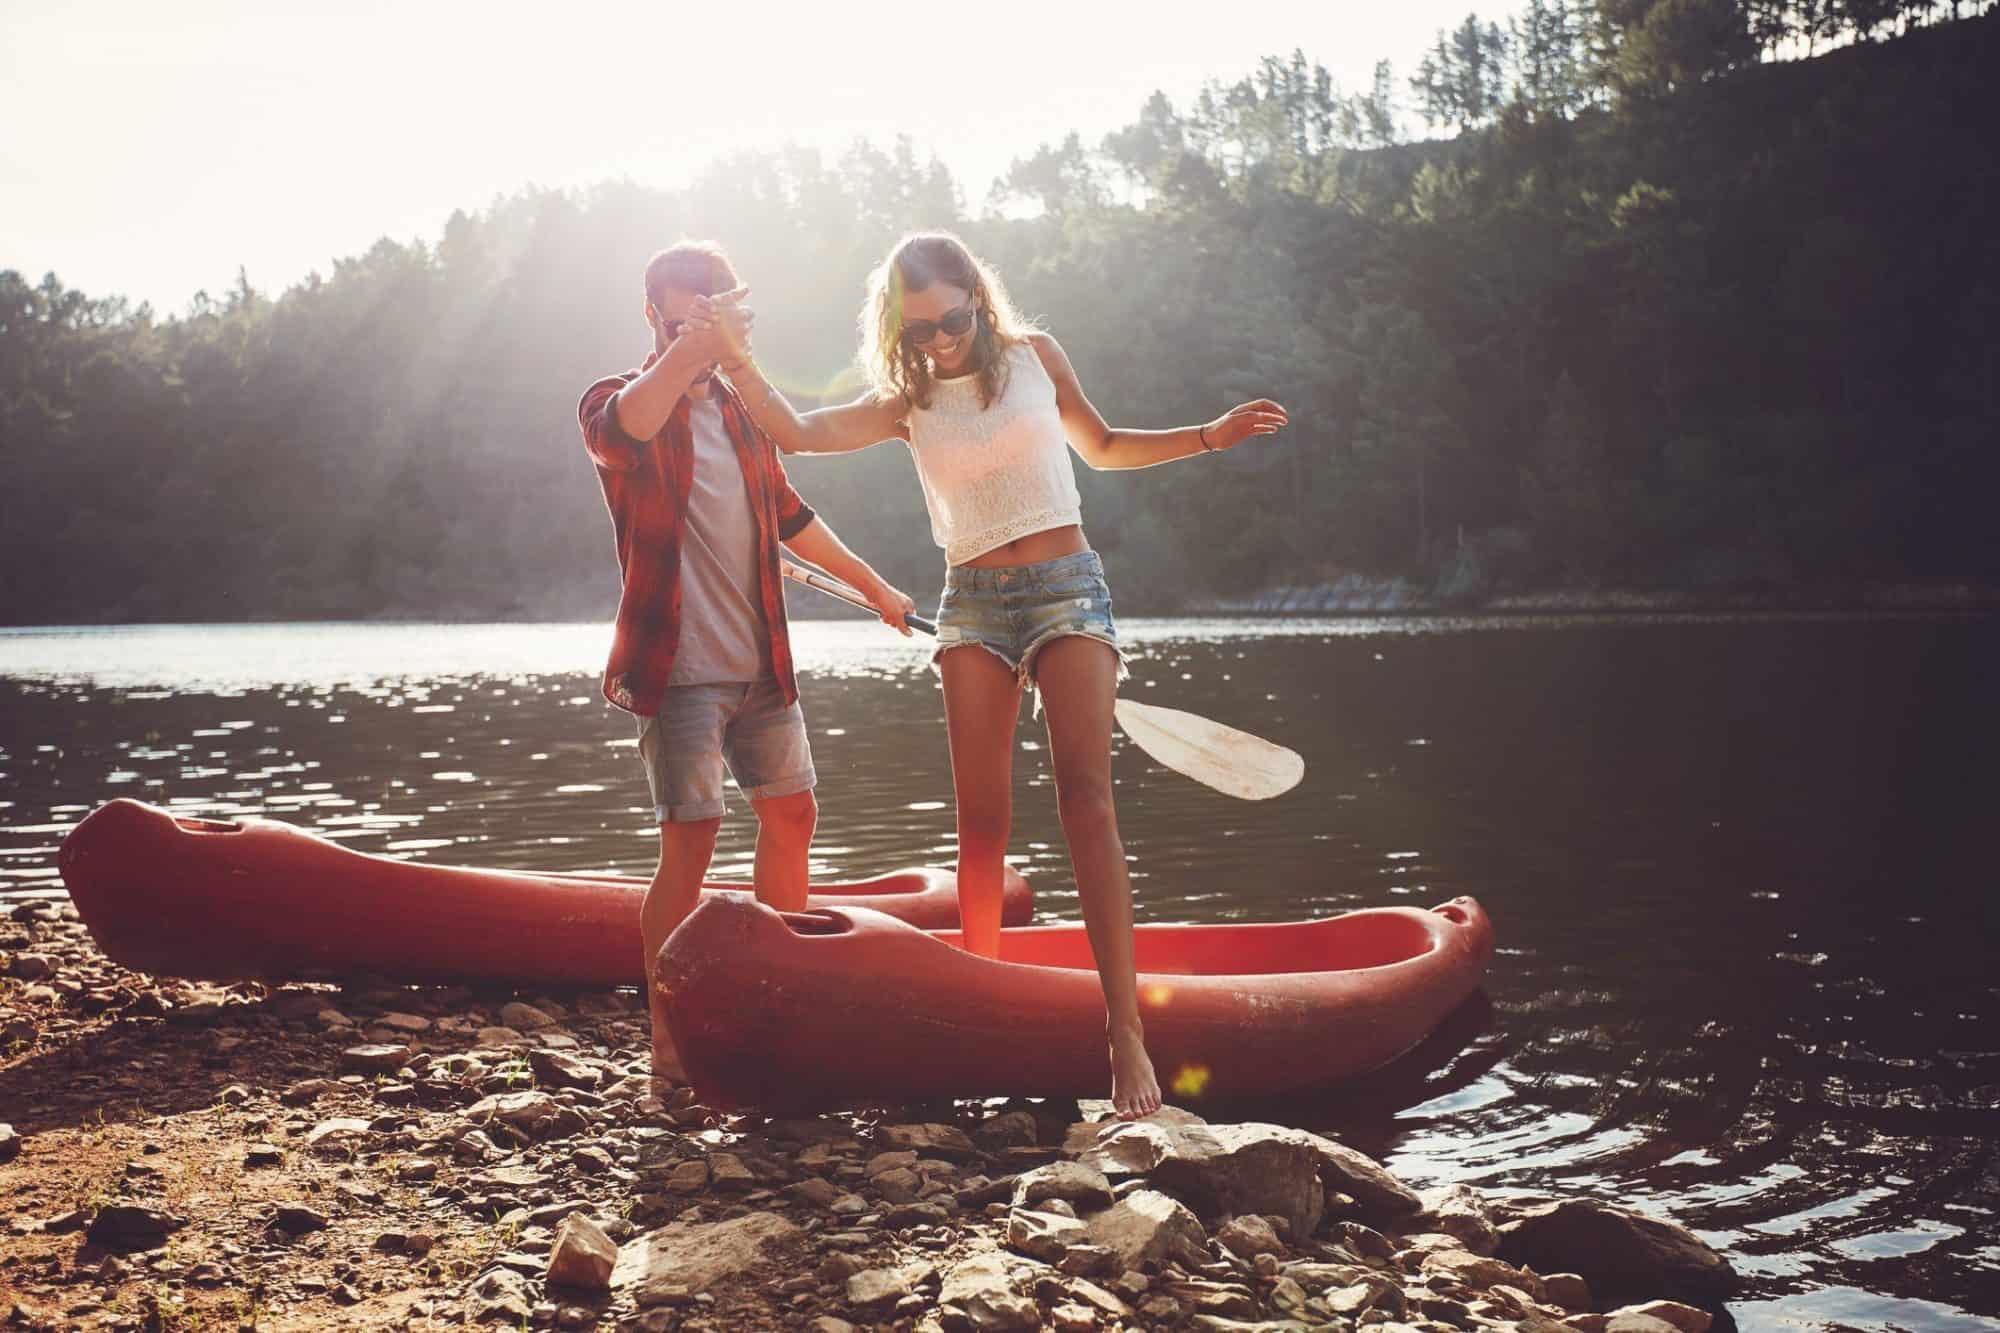 Insight for the Journey: Regaining Relational Balance